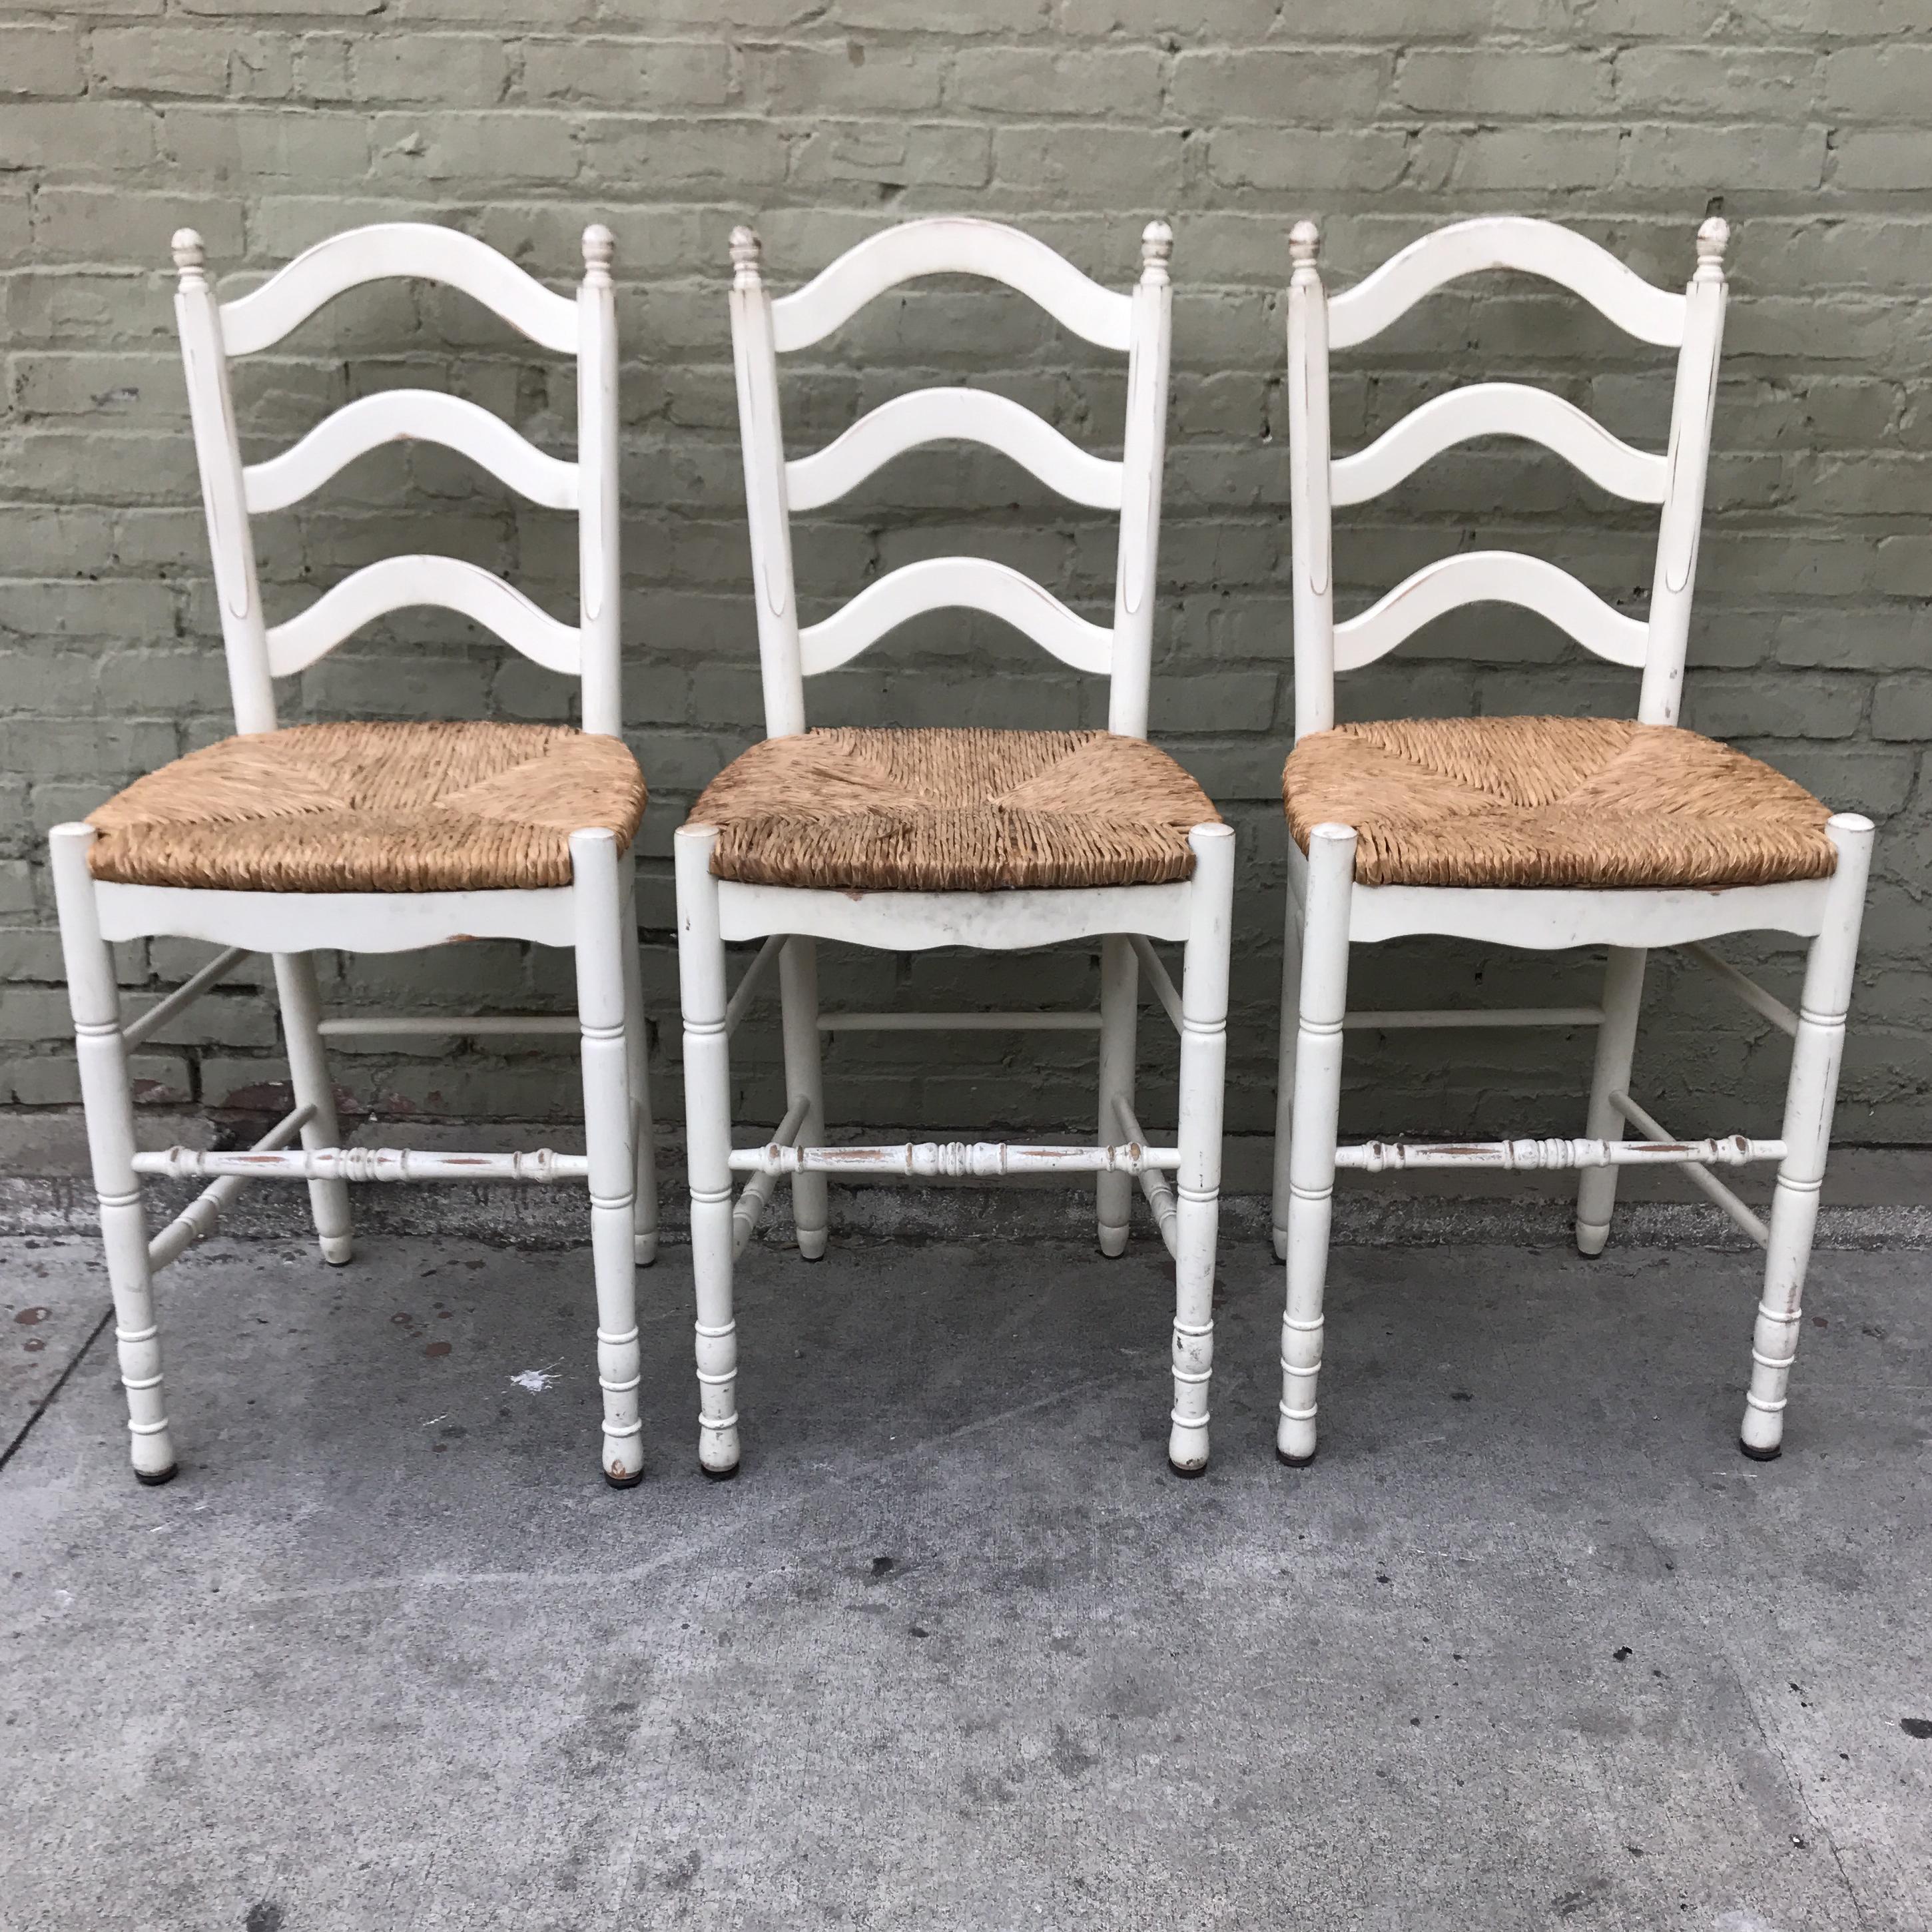 Painted Barstools With Rush Seats Set Of 3 Chairish